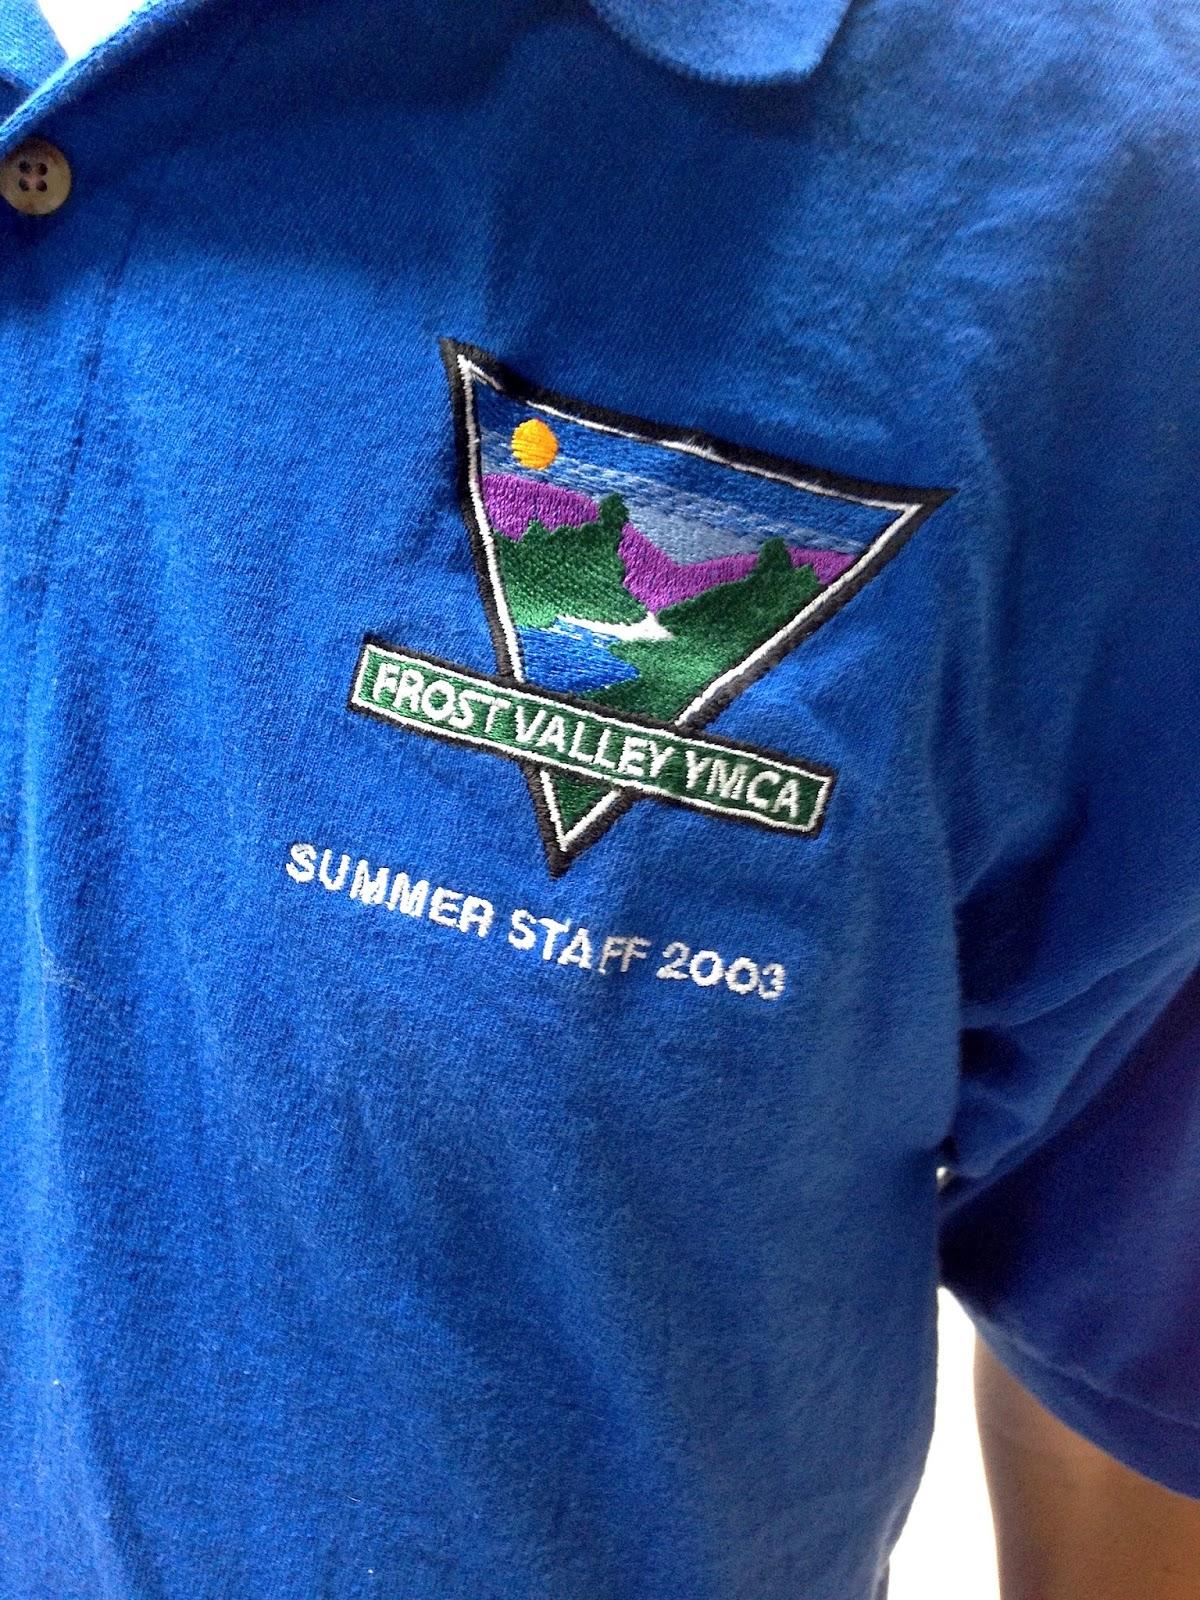 Al S Frost Valley Alumni Blog 2003 Staff Shirt In 2015